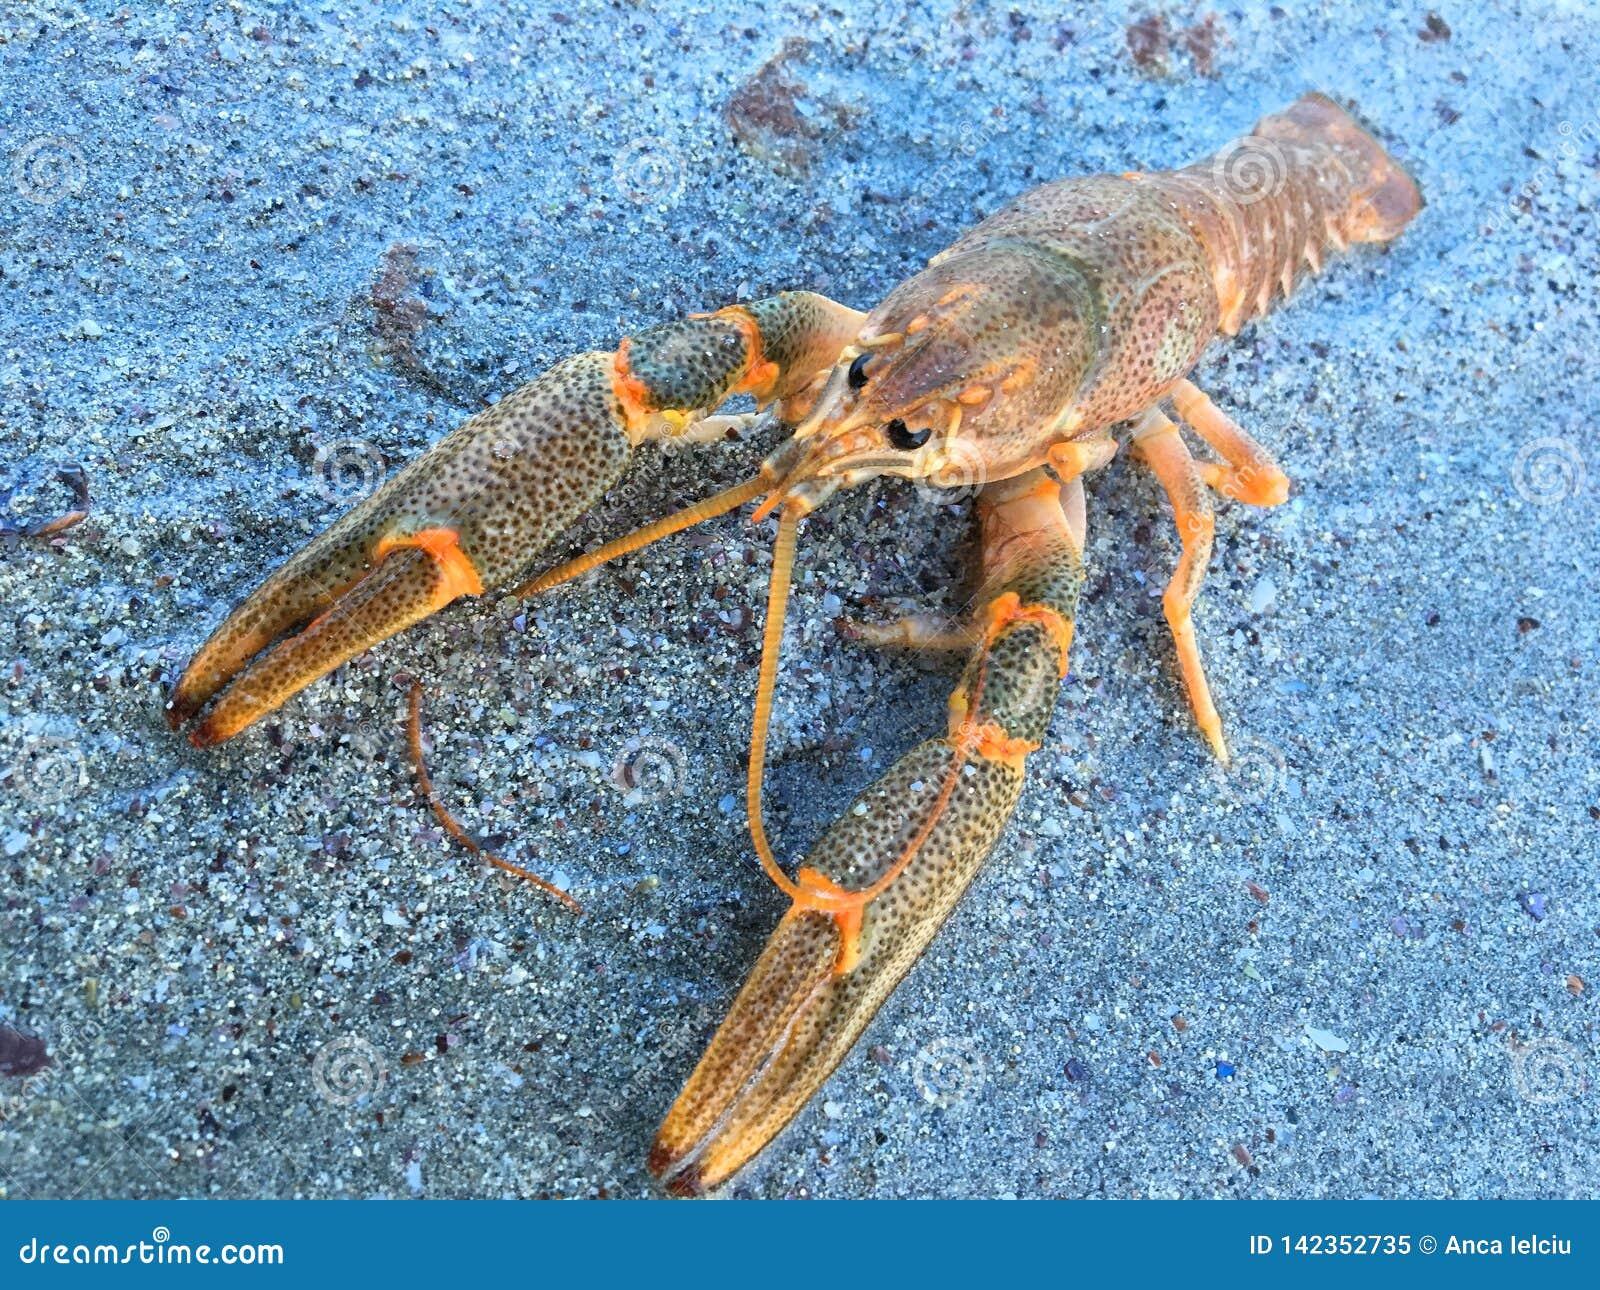 Small crustacean in Caspian Sea